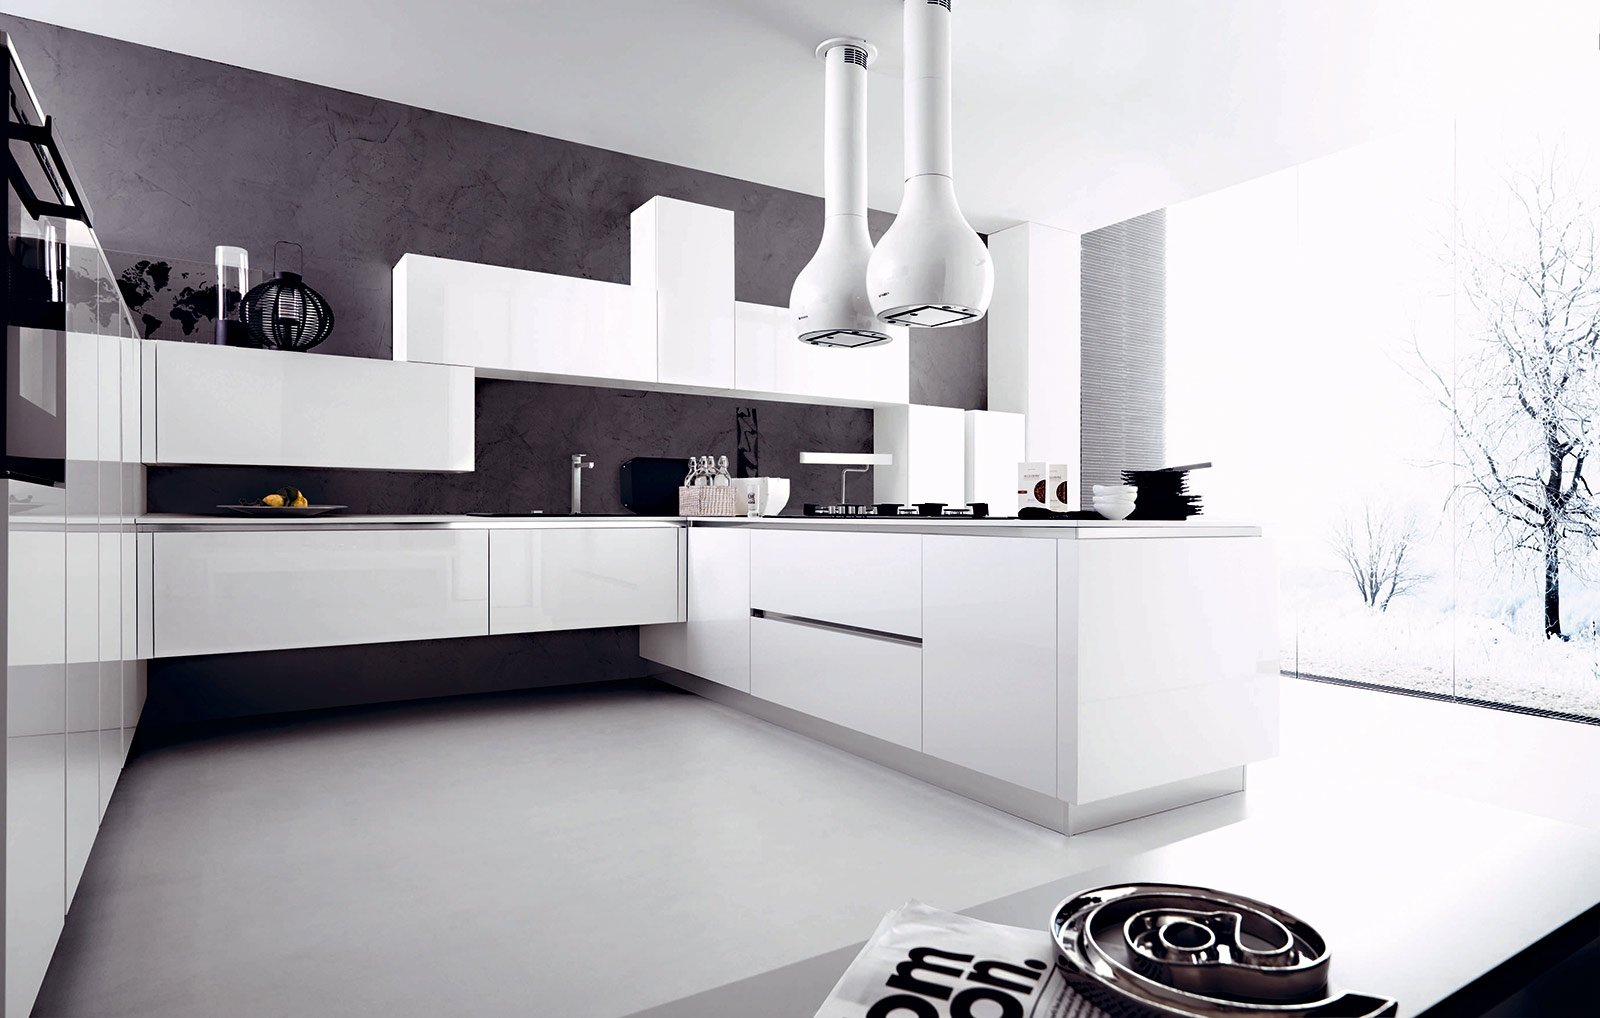 Cucina la voglio tutta bianca cose di casa - Disegni per cucina ...